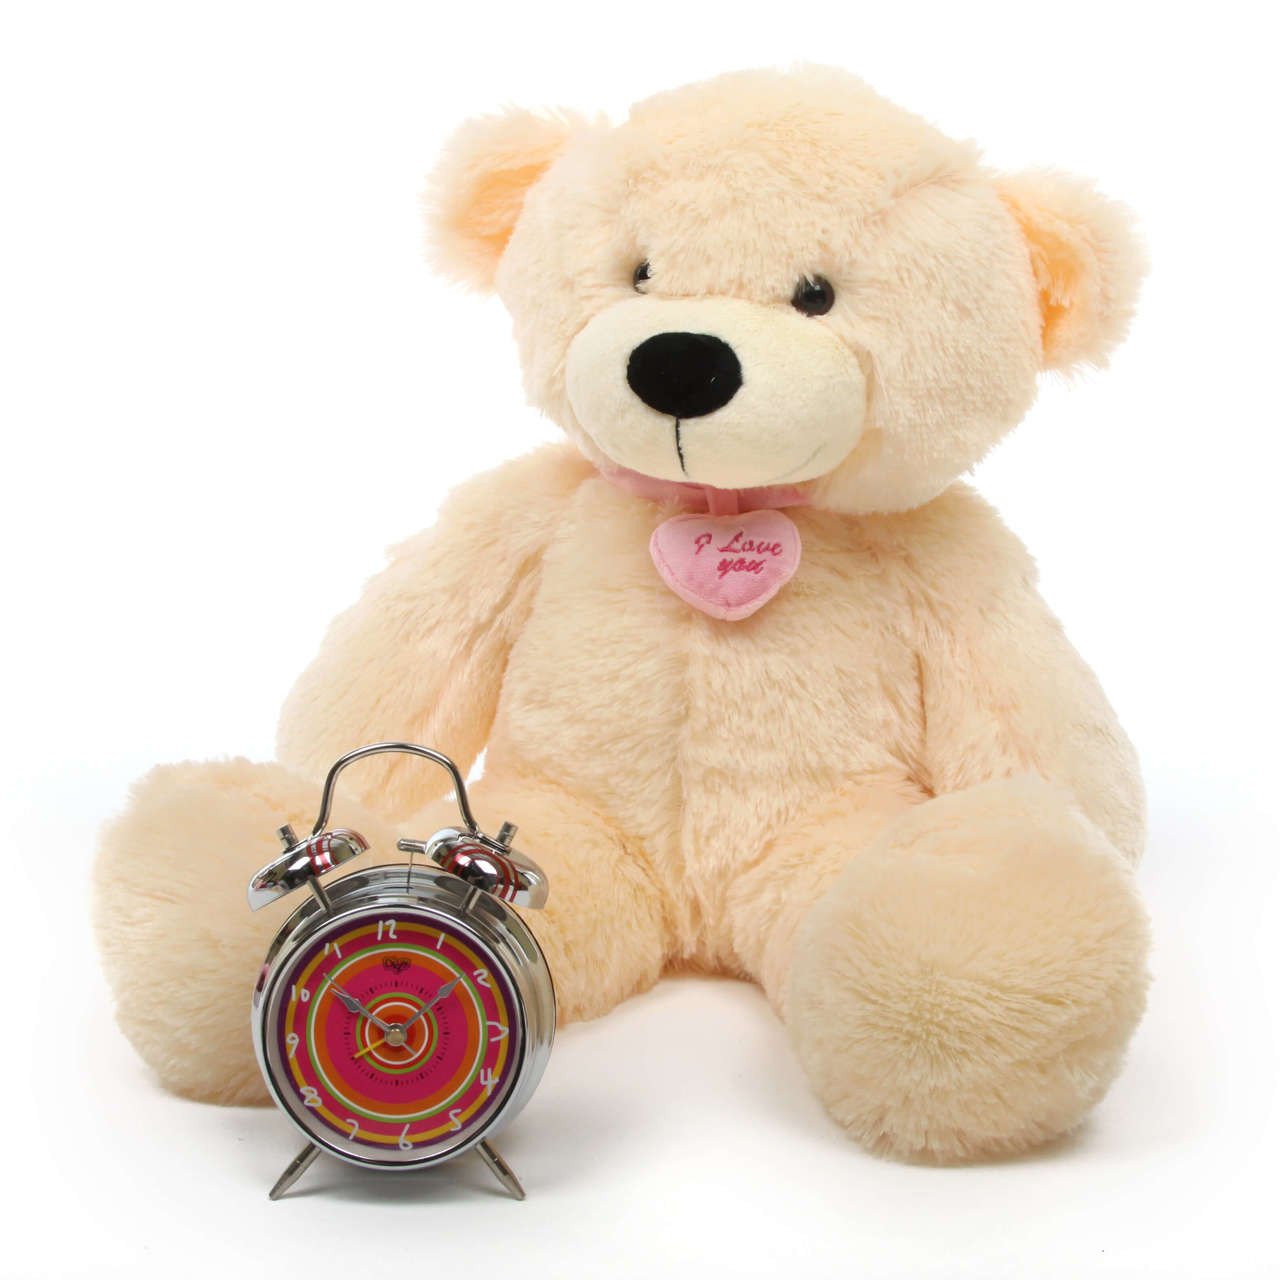 Cozy L Cuddles cream teddy bear with necklace 24in